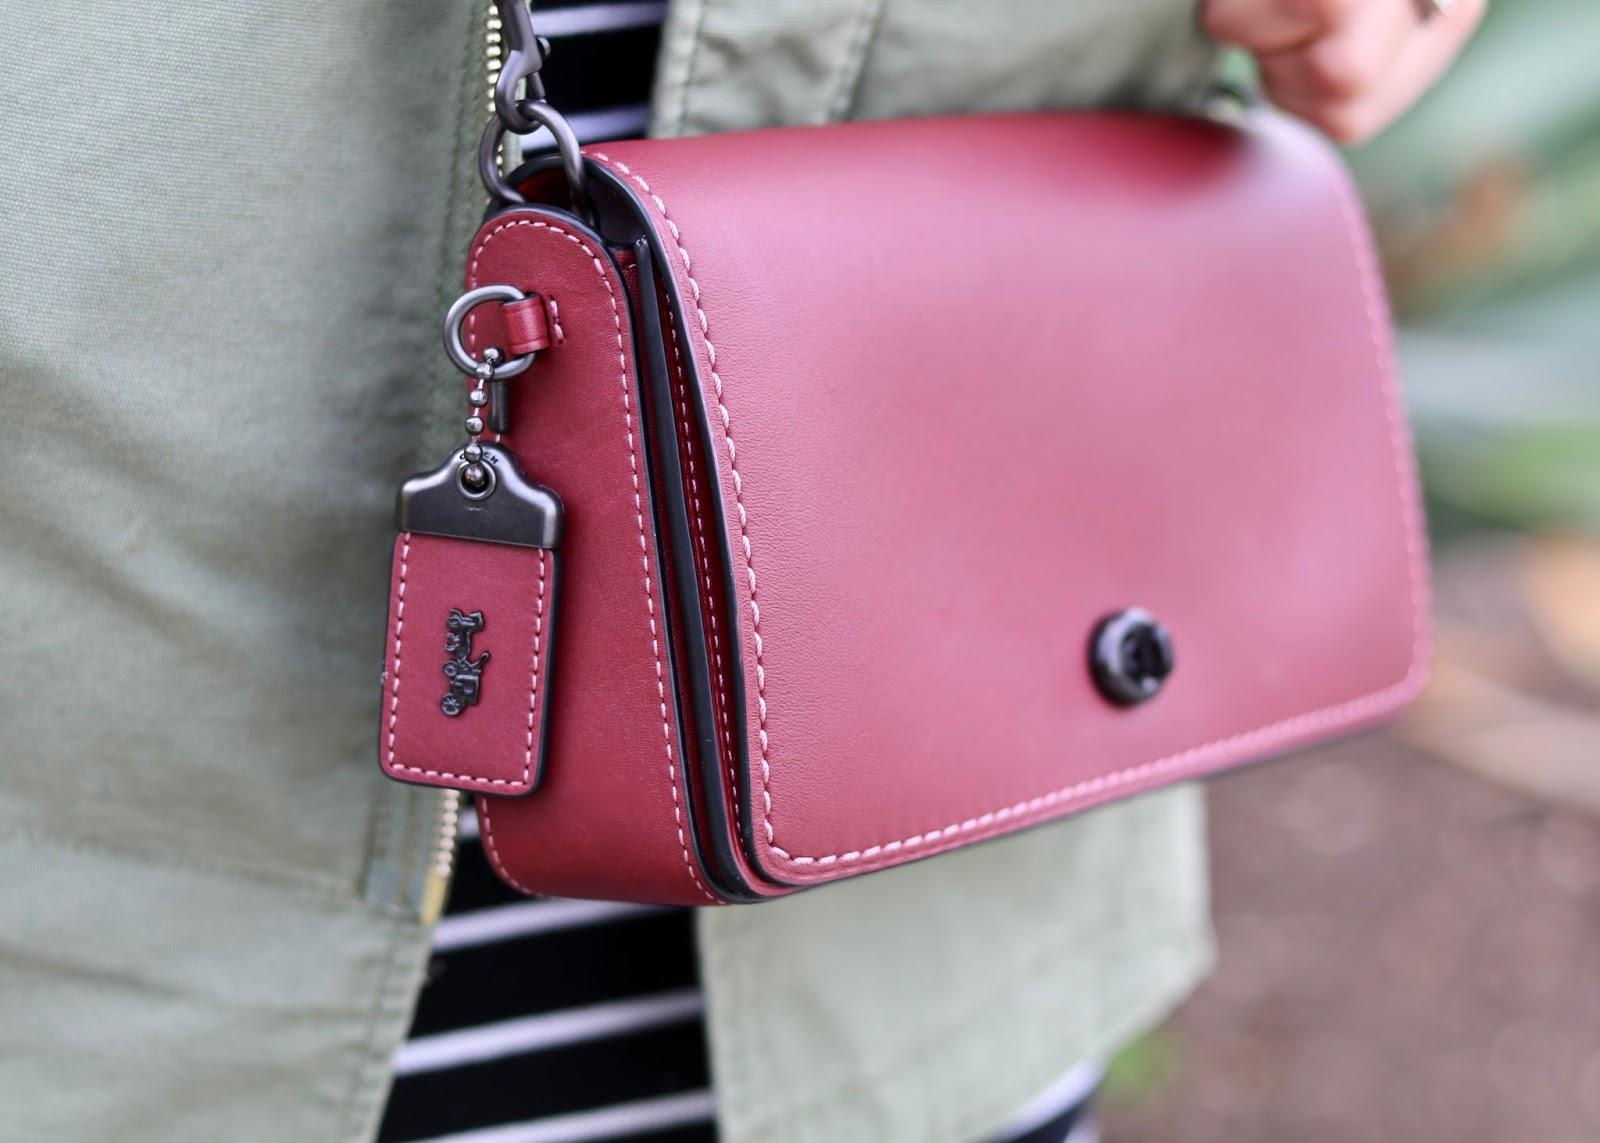 Coach Crossbody Dinky Purse, coach updated design, how to wear a coach purse